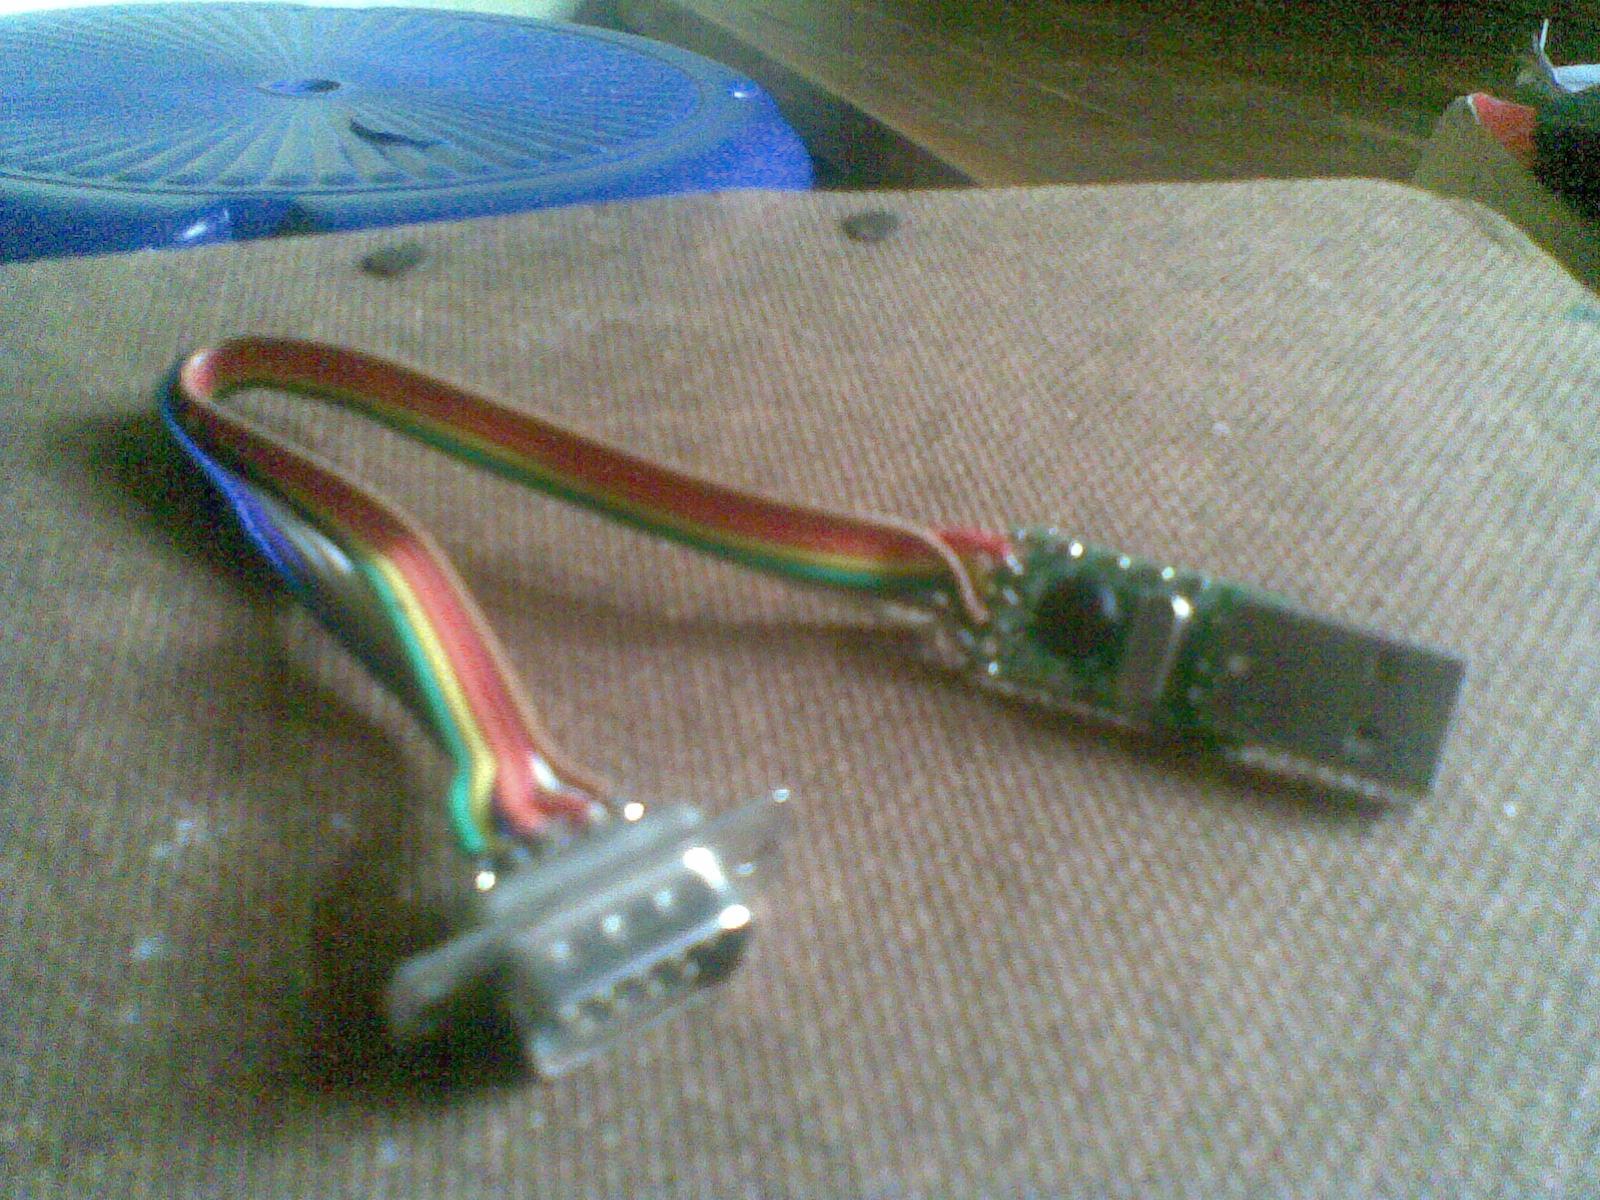 usb to serial port wiring diagram kenwood kdc 108 stereo diy cheapest converter  achu 39s techblog